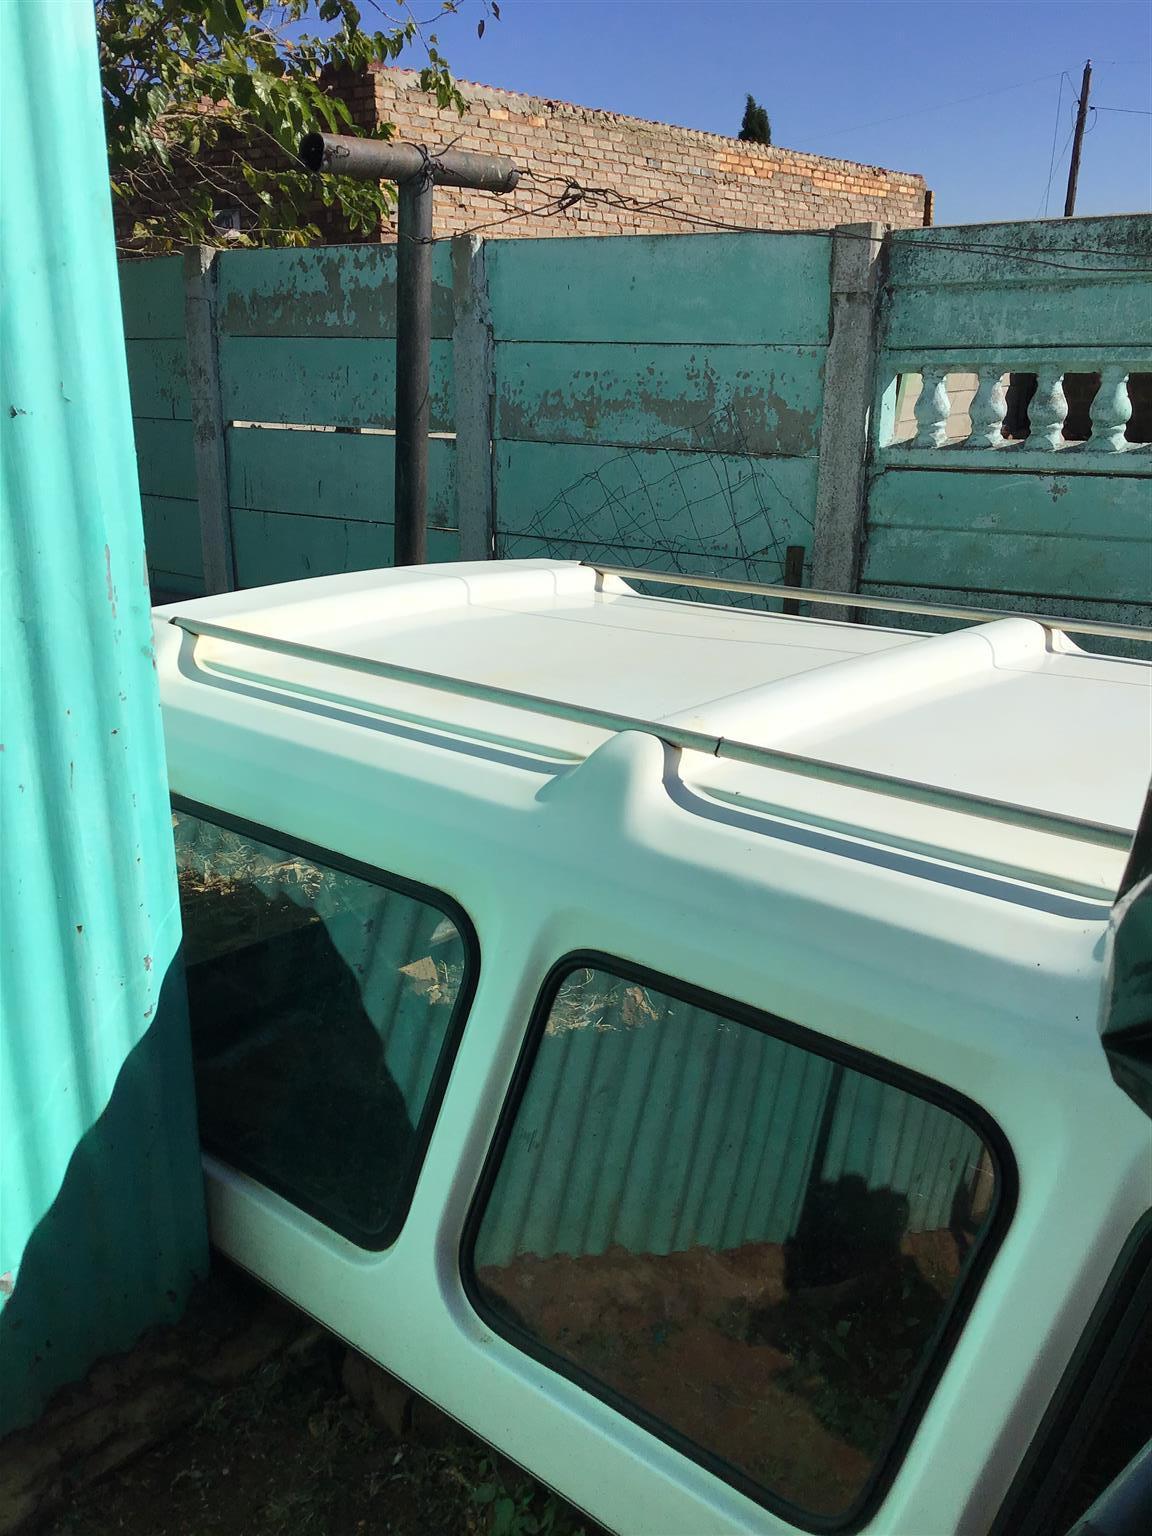 Canopy for Kia 2700